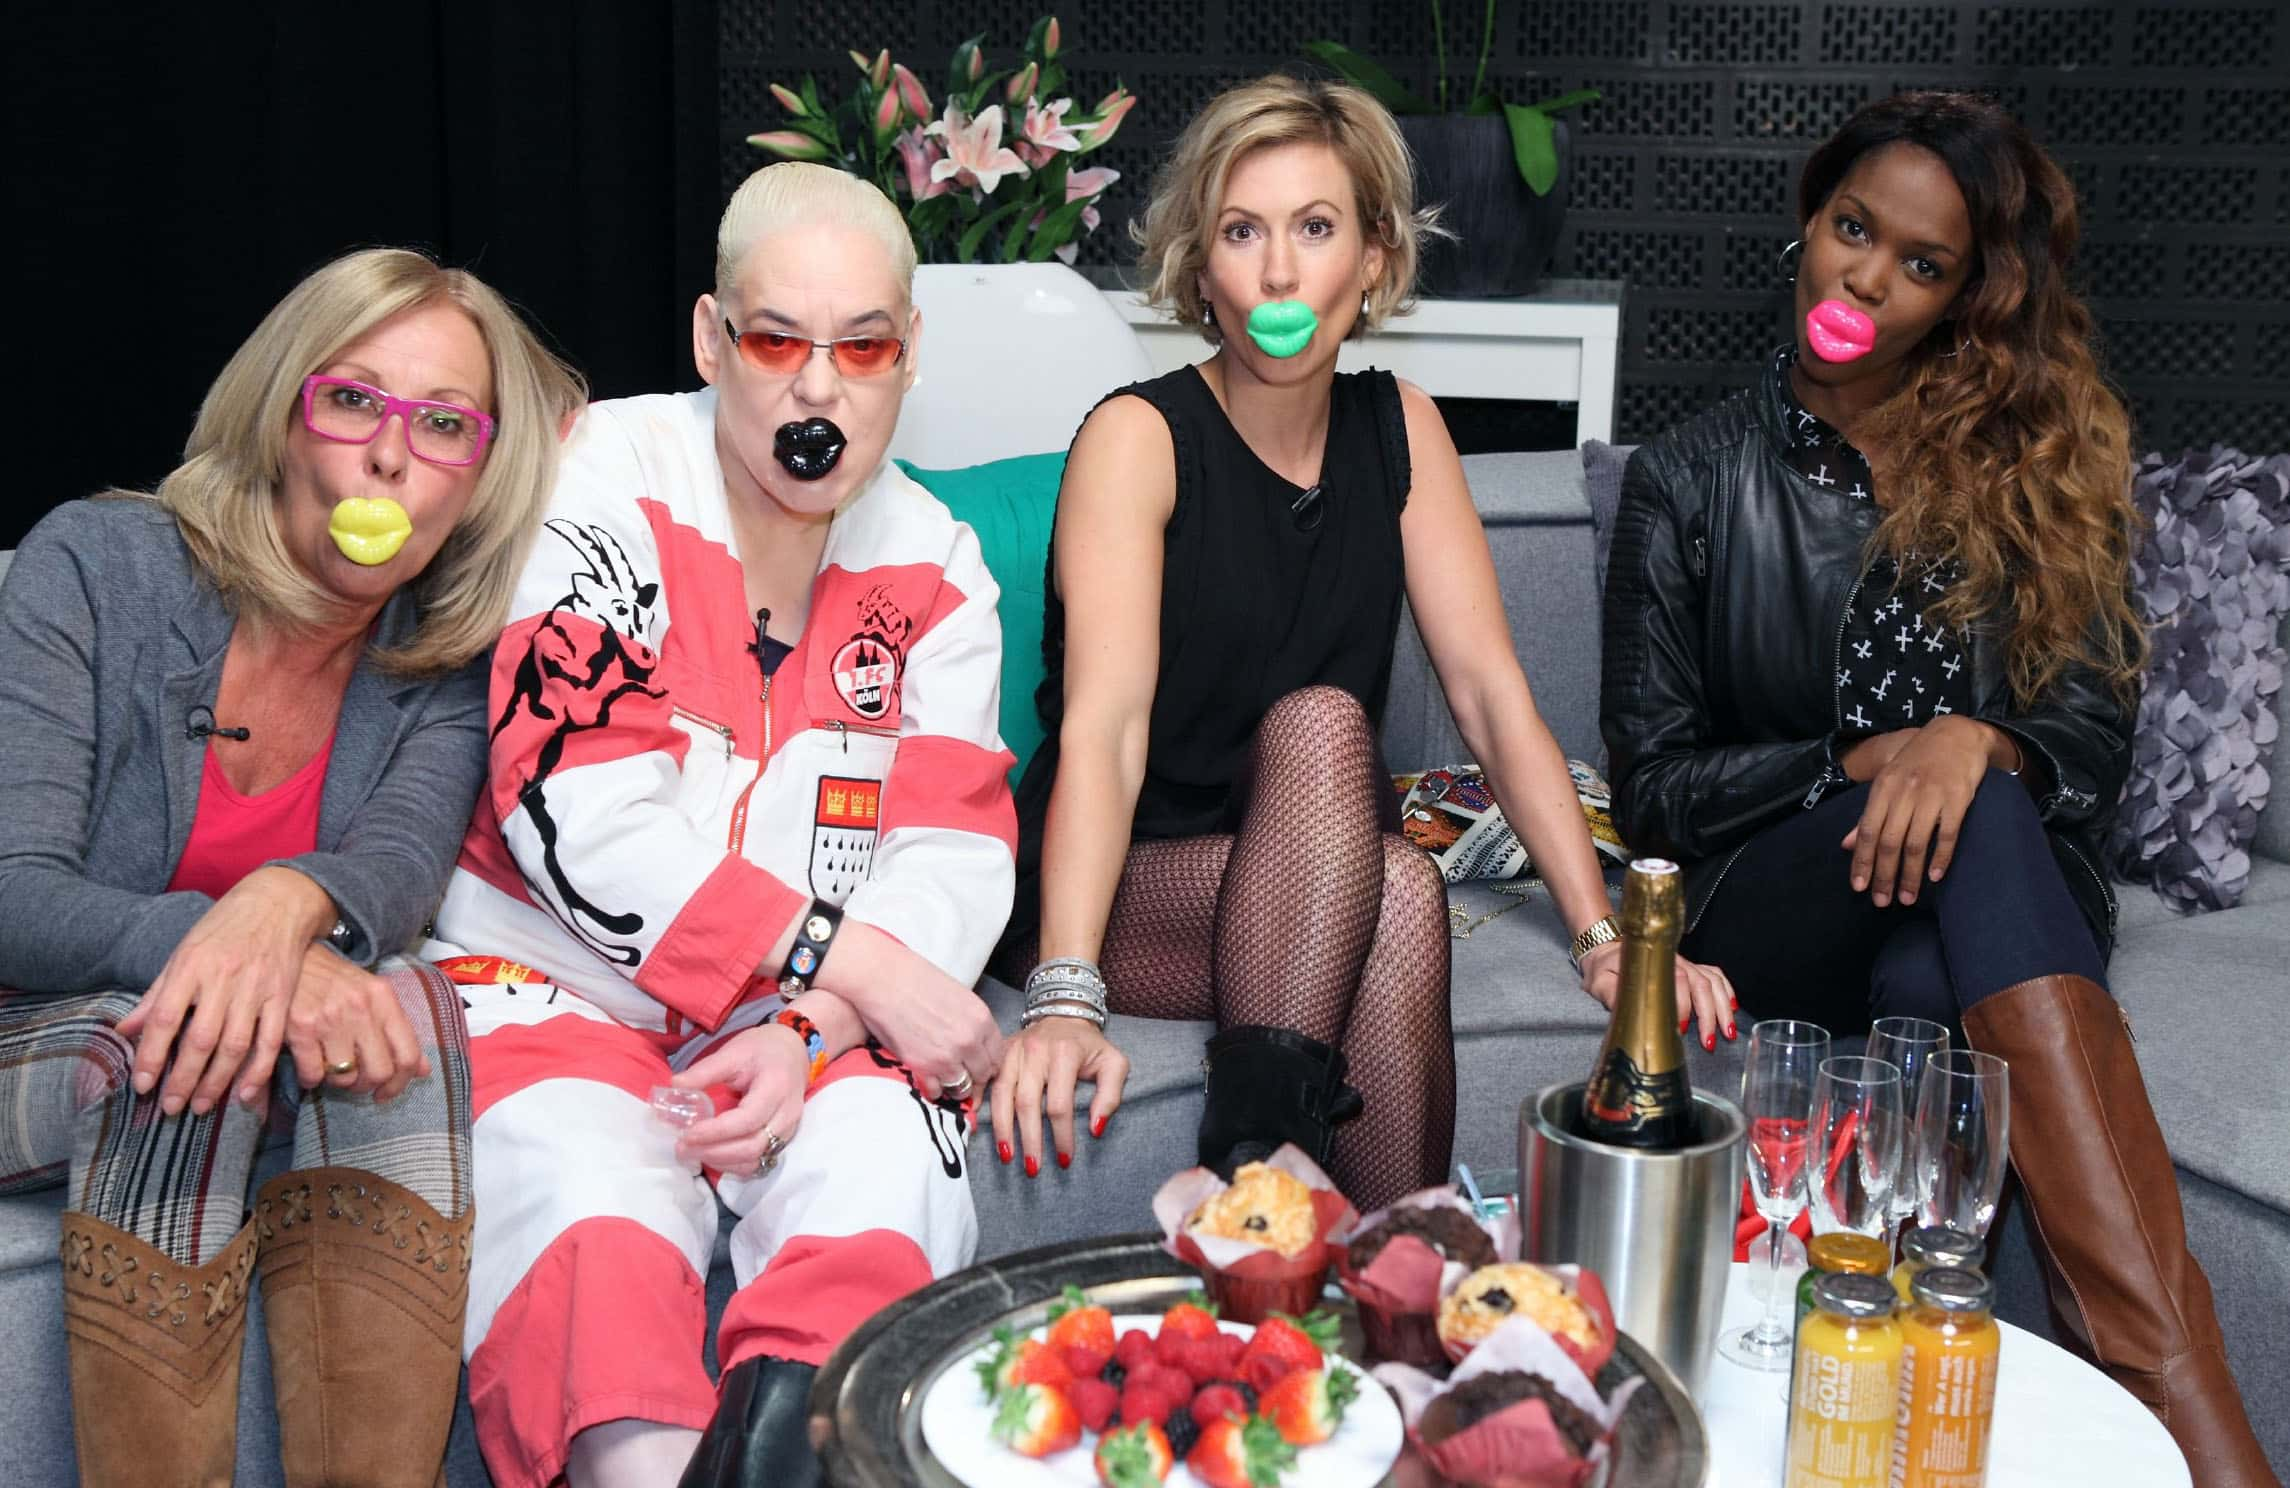 Margarethe Schreinemakers Nackt shopping loomee tv